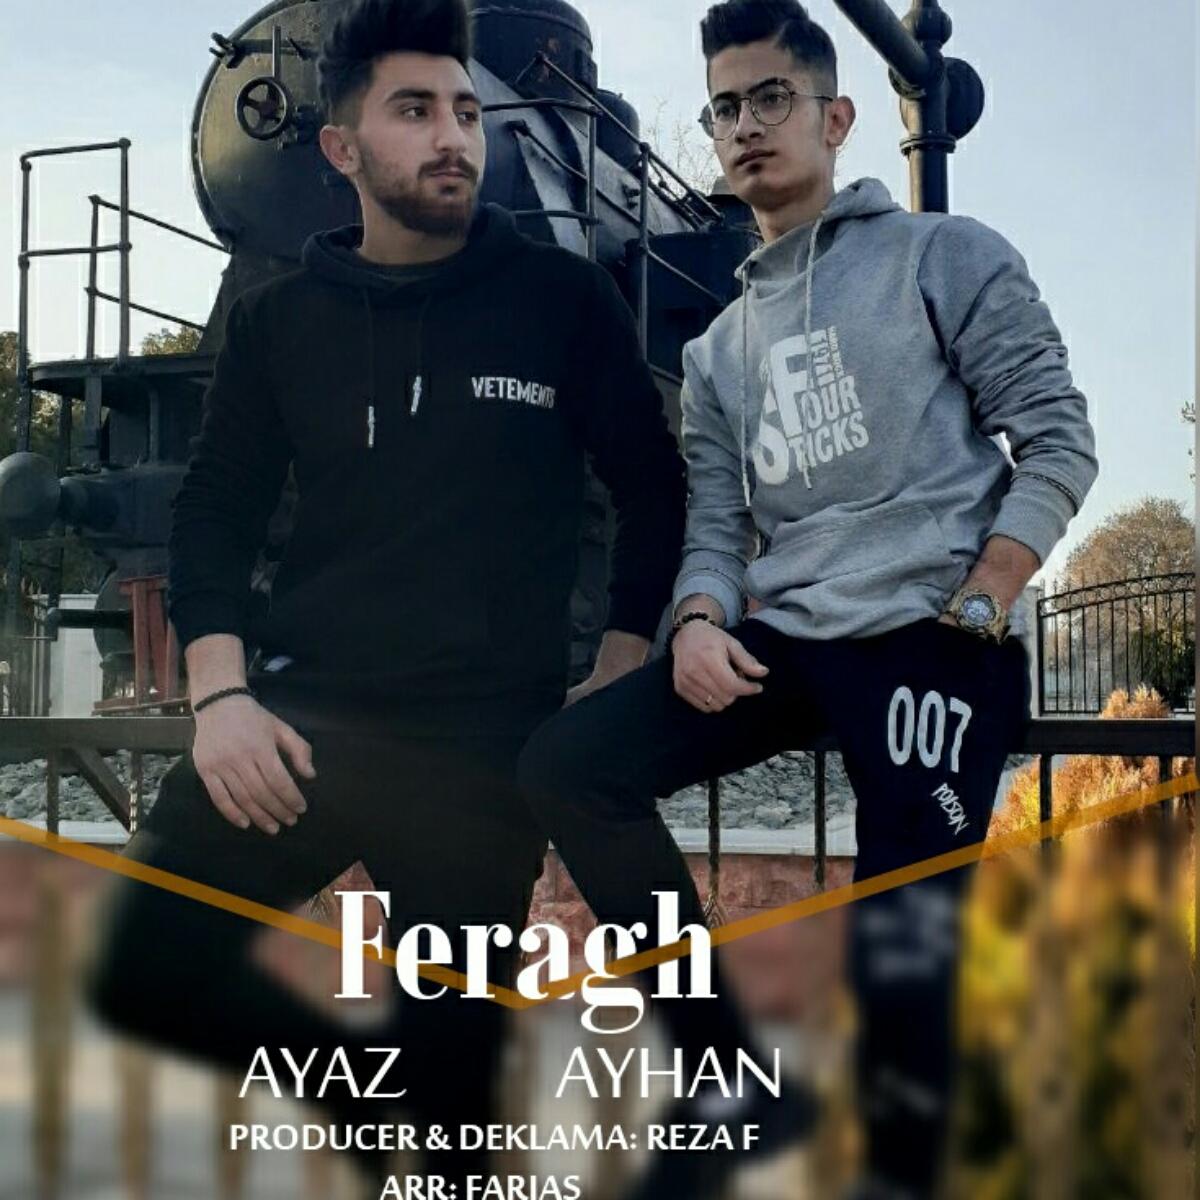 http://s7.picofile.com/file/8392390776/02Ayaz_Ayhan_Feragh.jpg